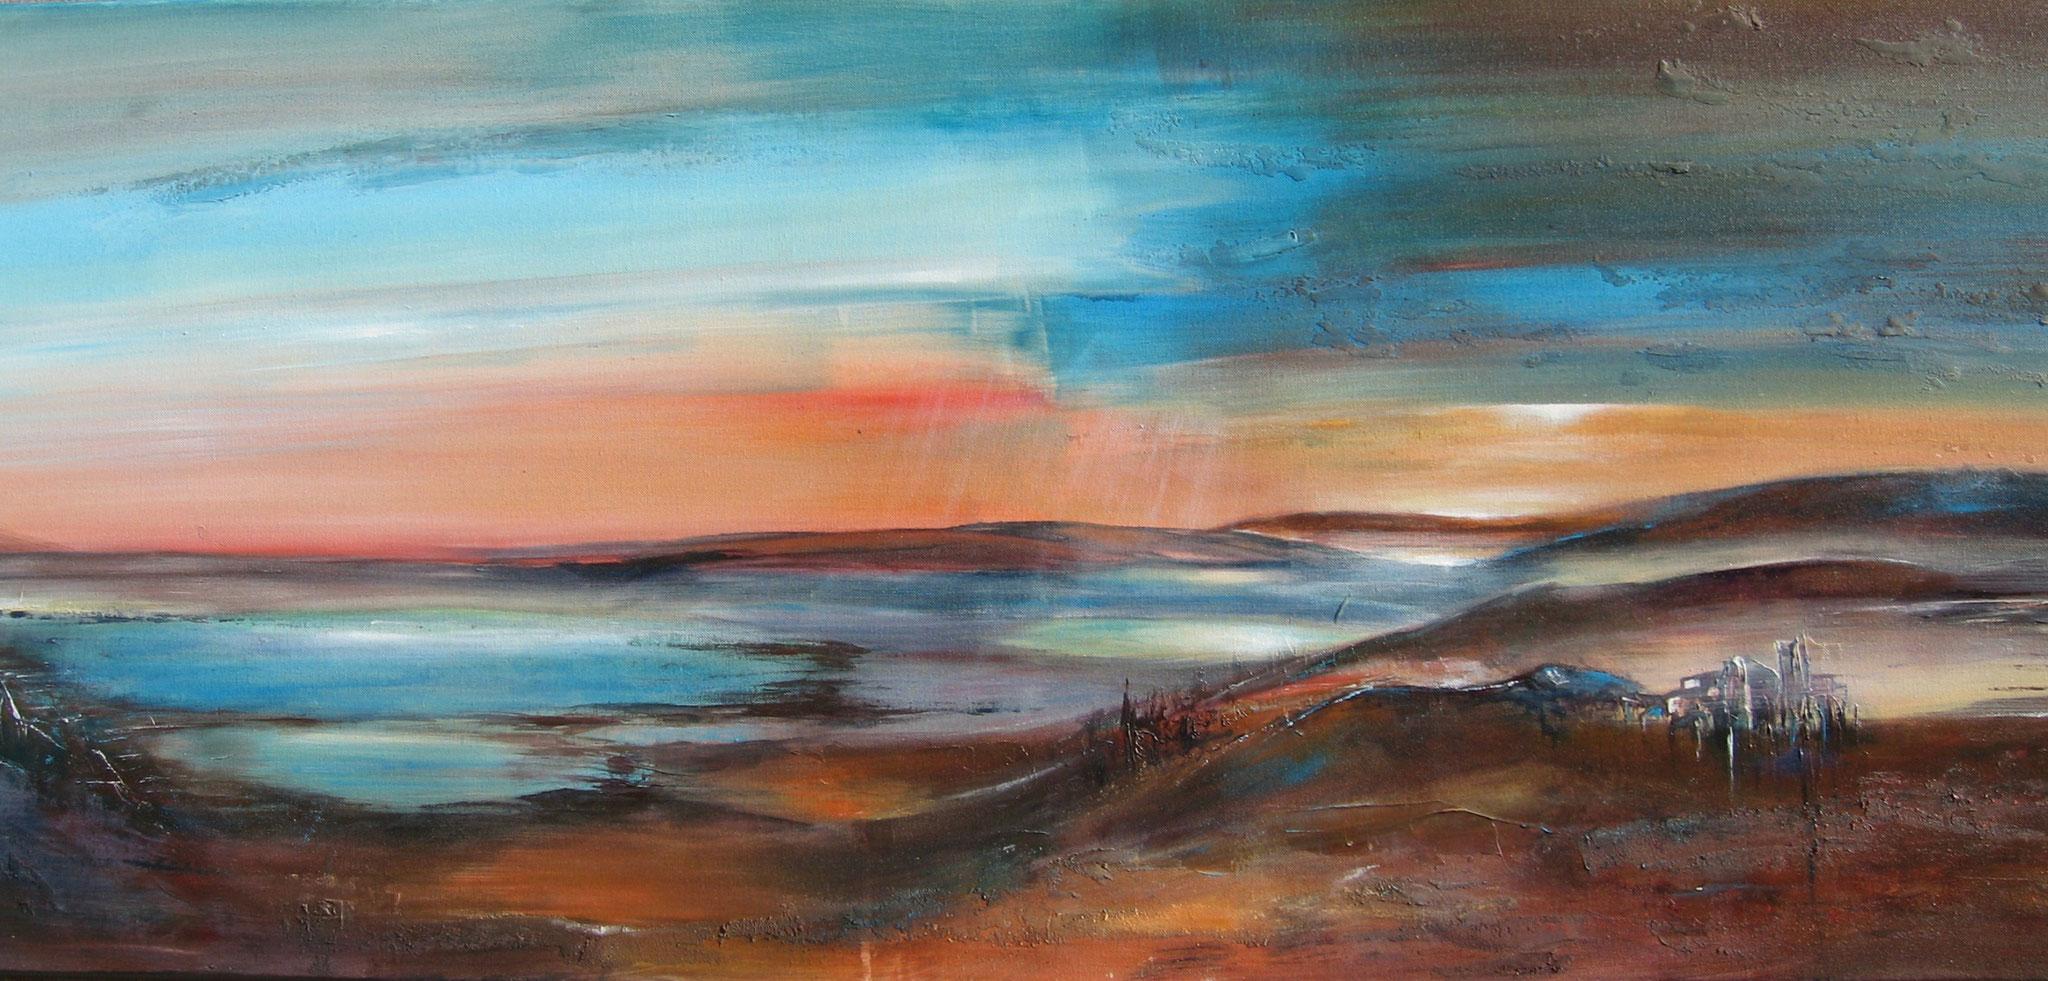 Fünfseenlandschaft, Acryl, 60 x 165 cm